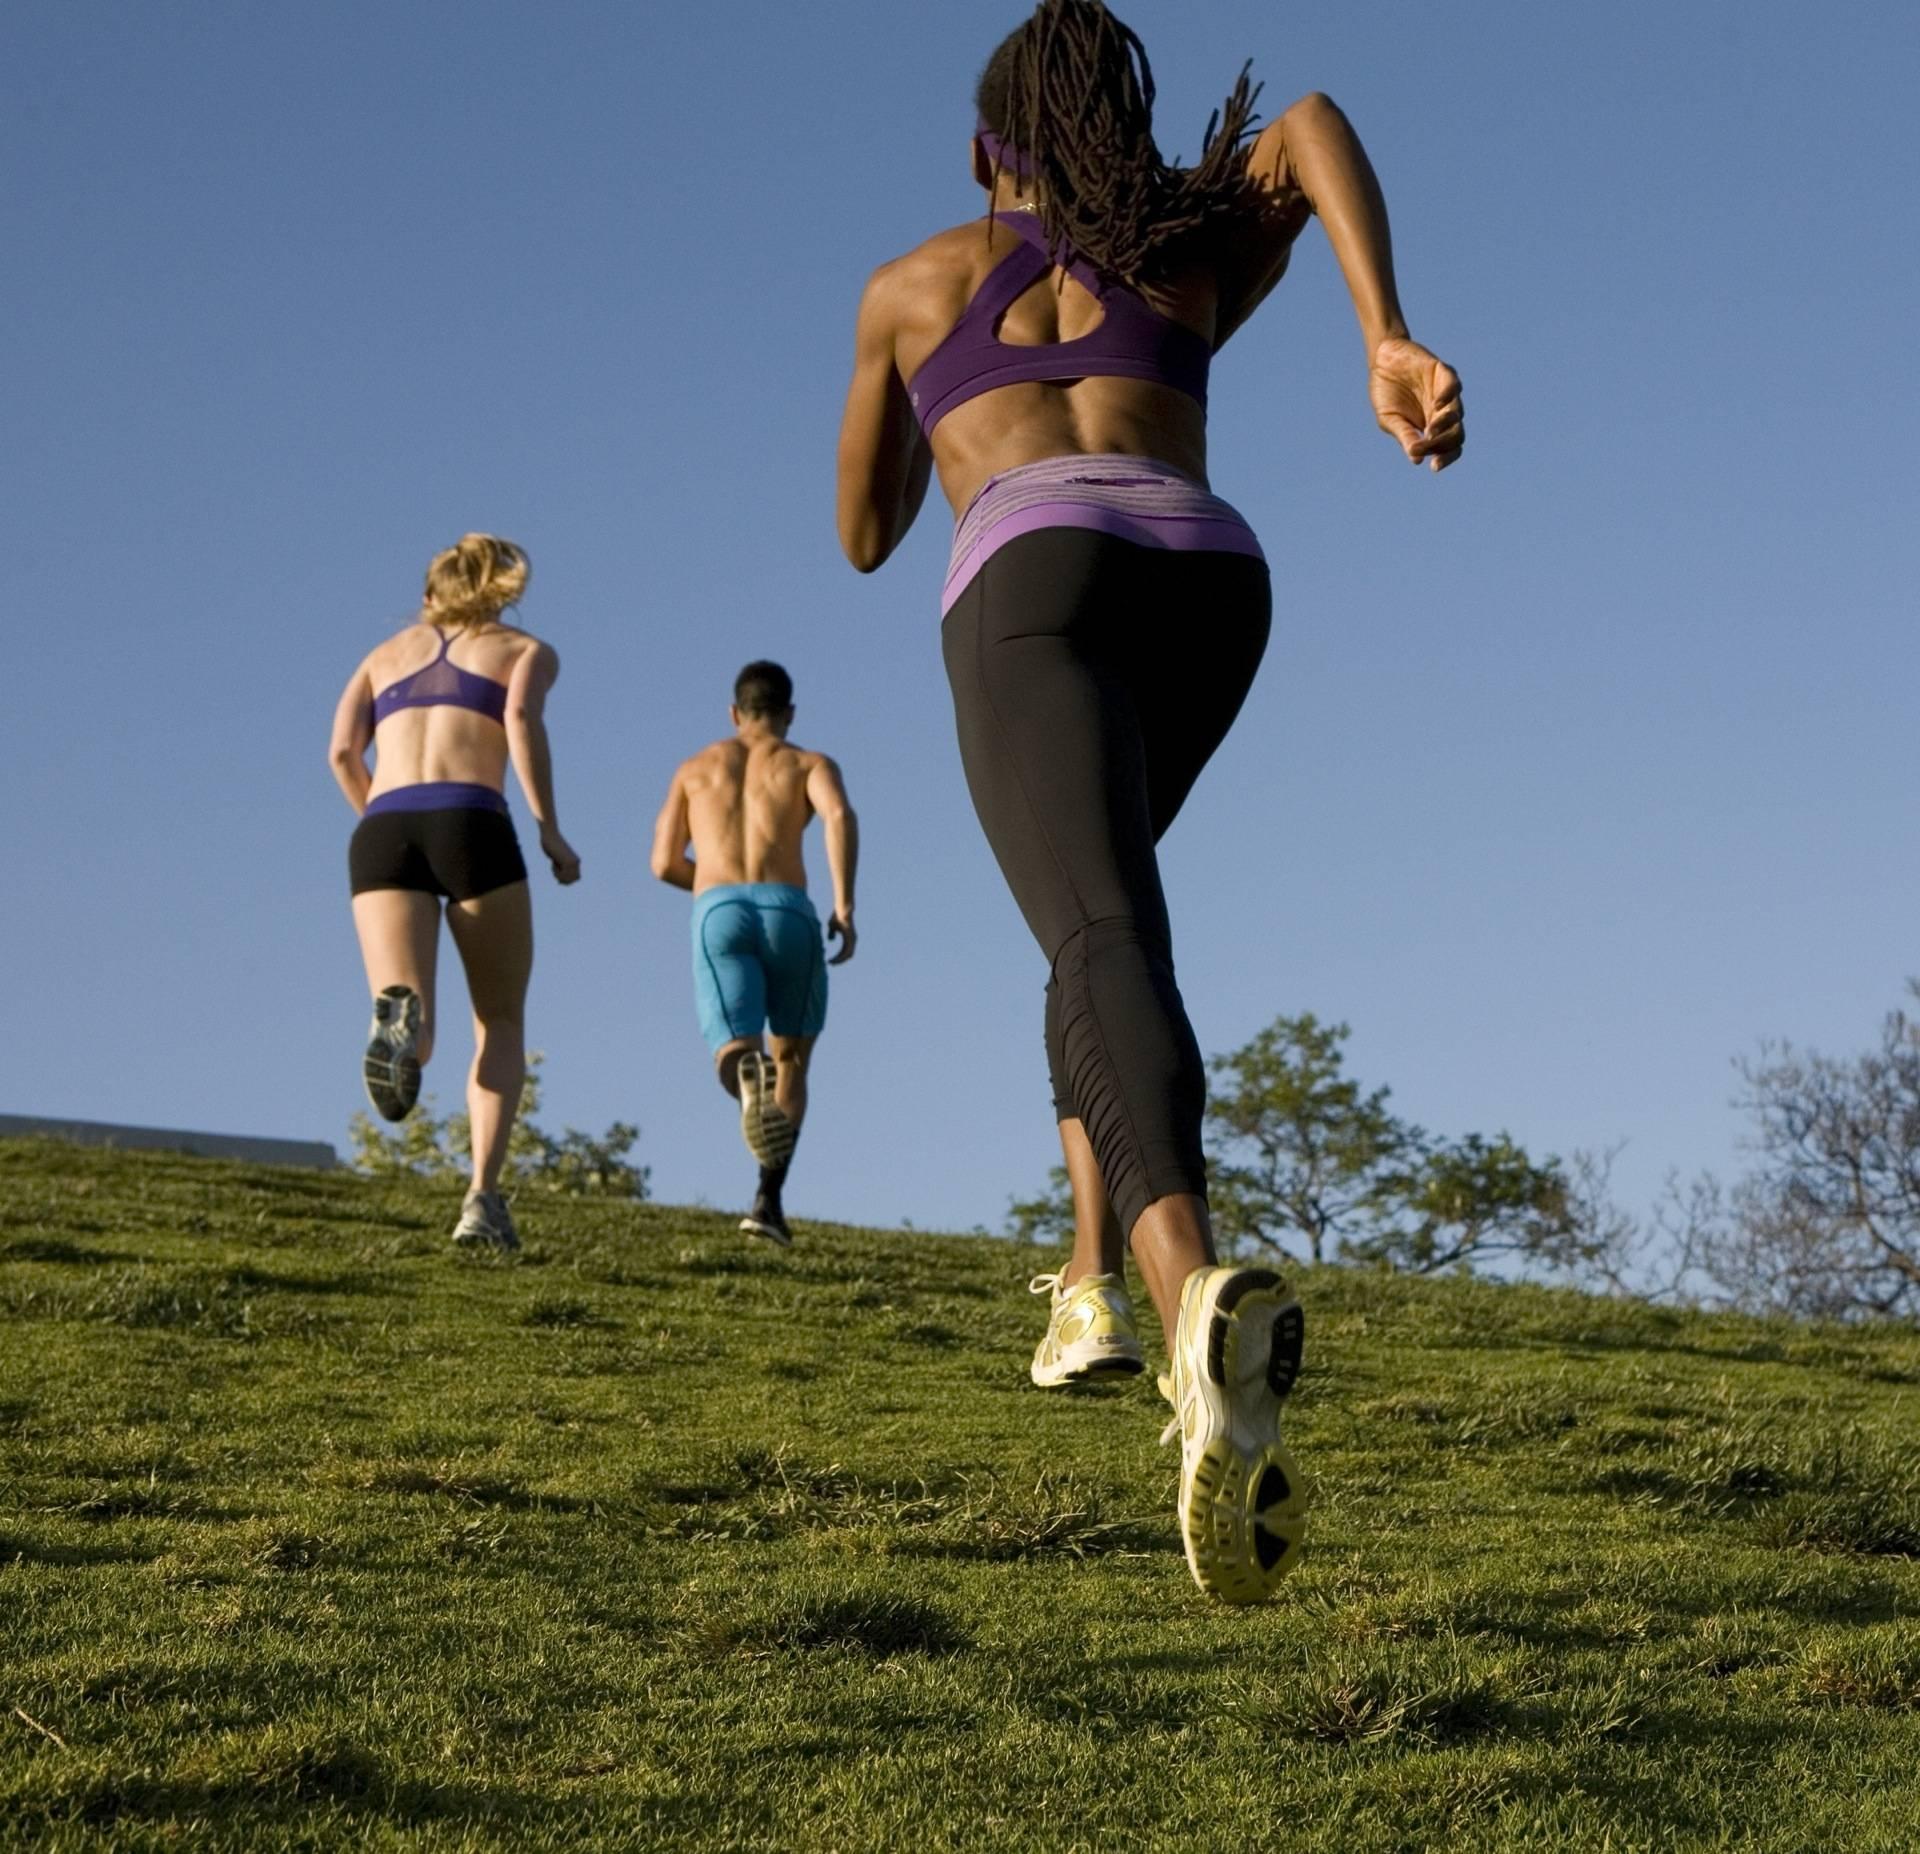 Занятия бодибилдингом: польза и вред | польза и вред